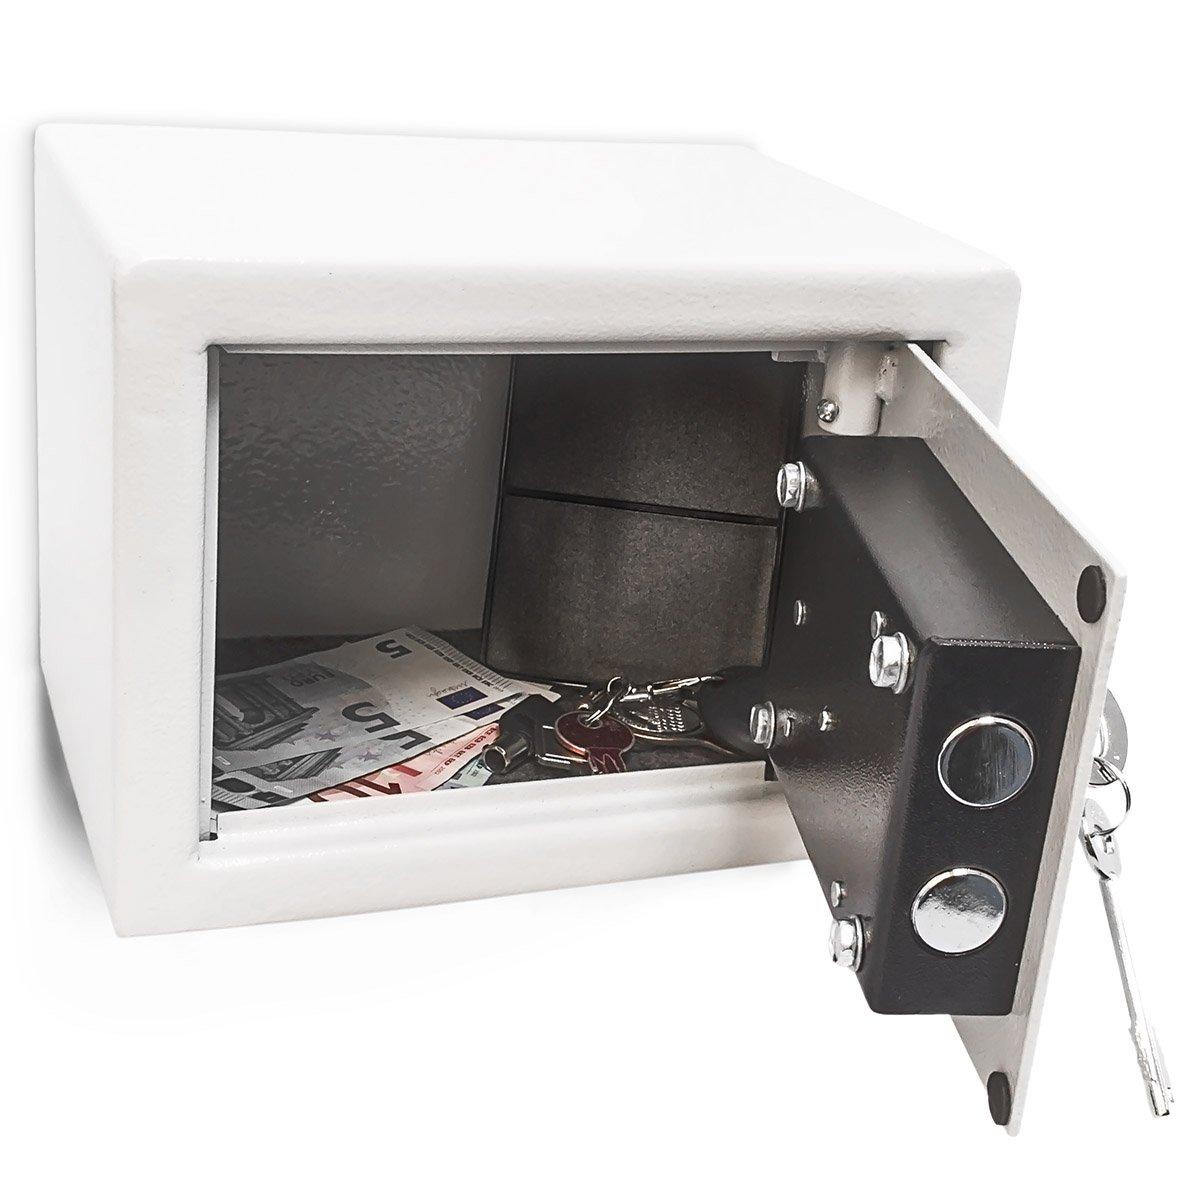 relaxdays mini safe mini tresor wandresor m beltresor mit. Black Bedroom Furniture Sets. Home Design Ideas